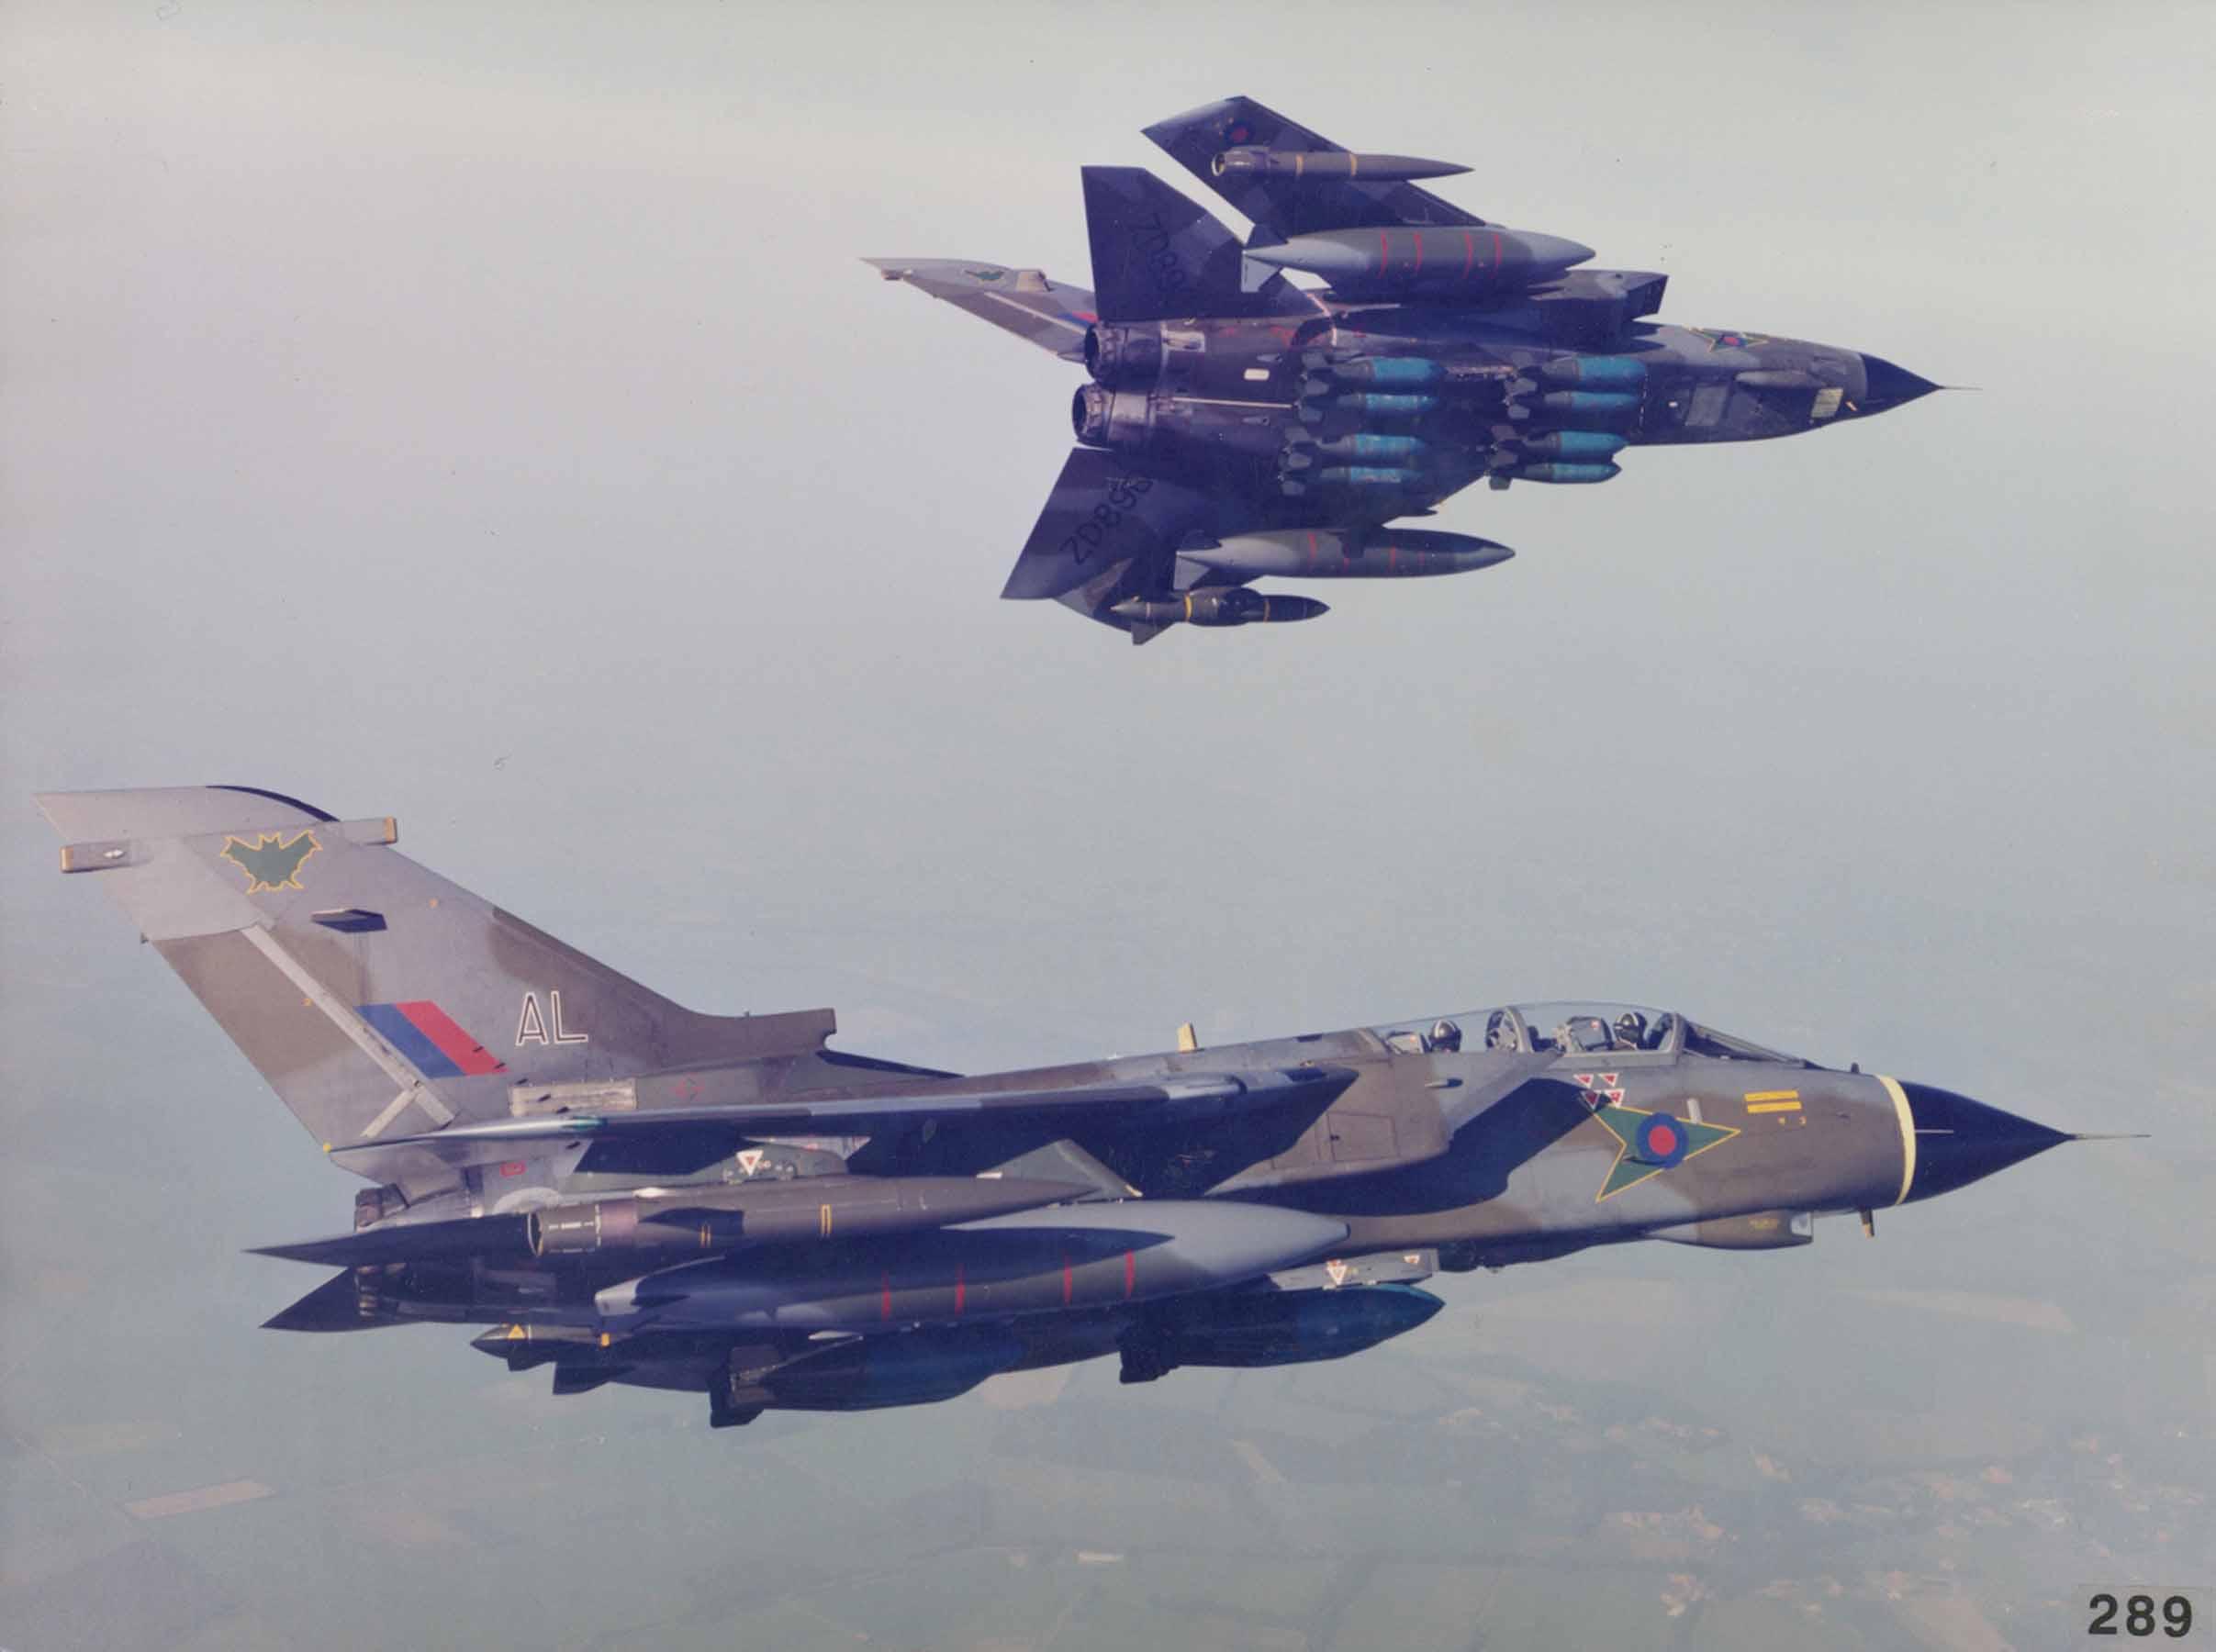 Two_Panavia_Tornado_GR1_of_No.9_Squadron